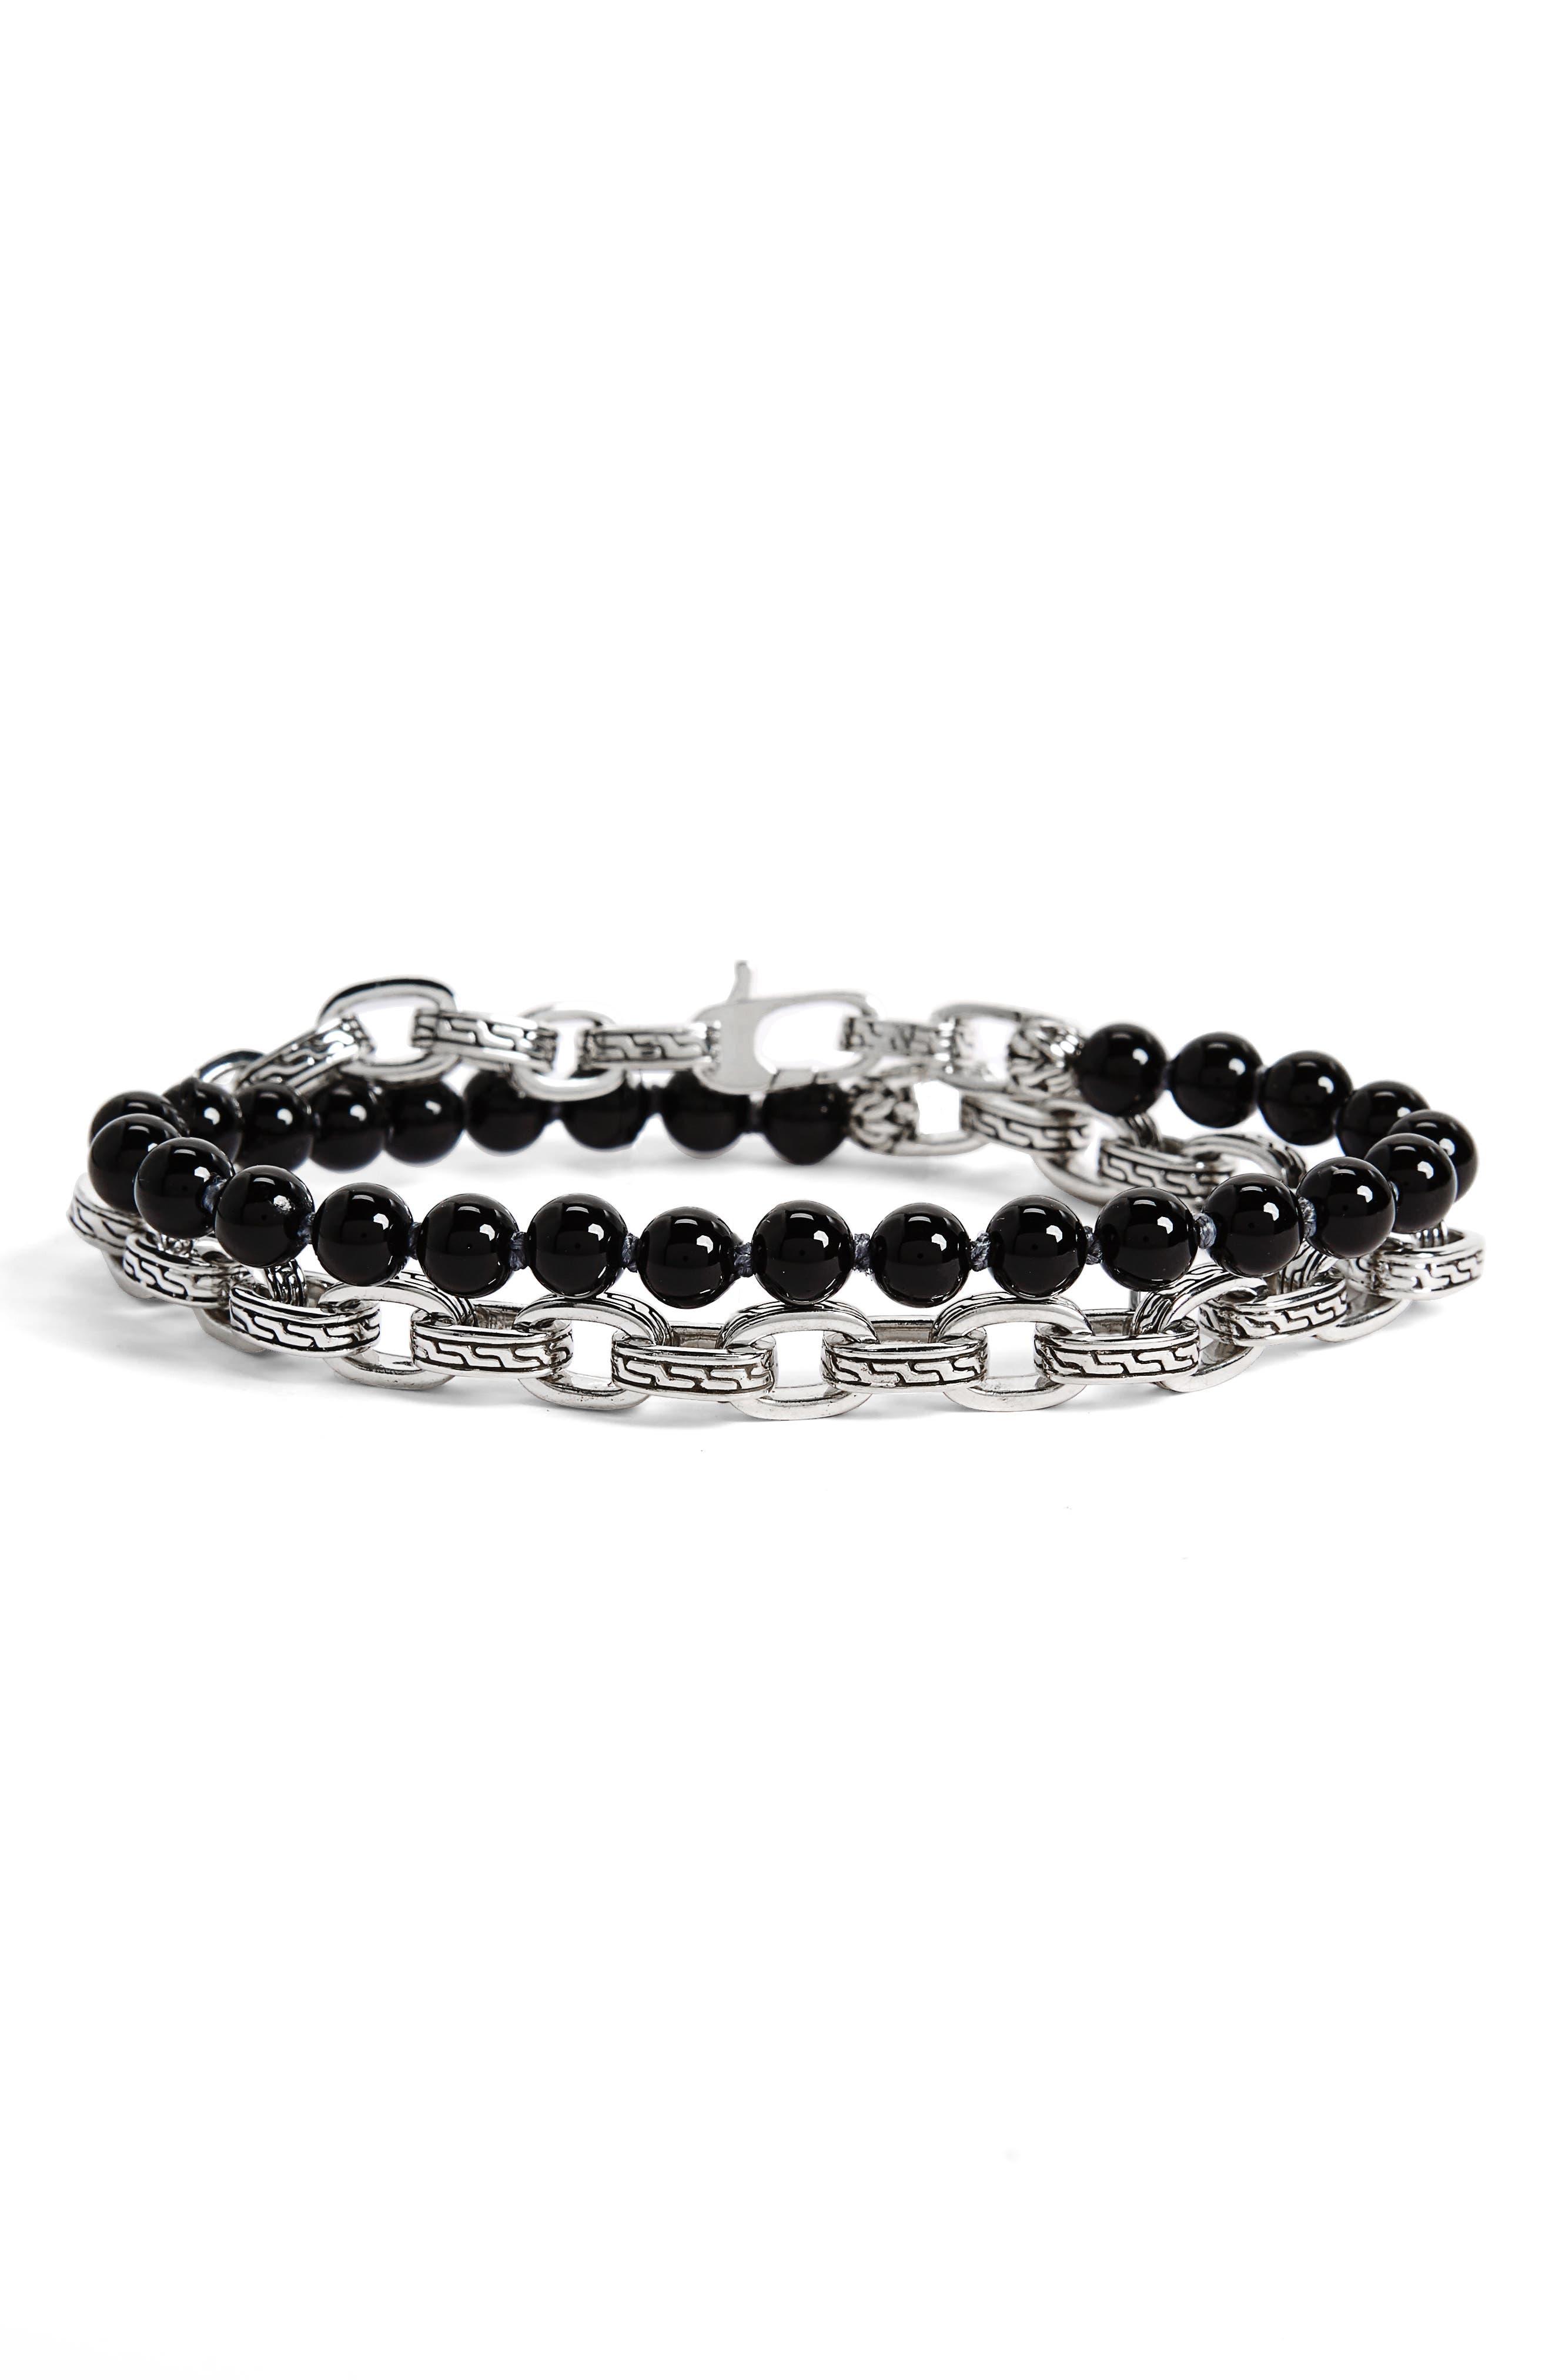 Classic Chain Black Onyx Double Wrap Bracelet,                             Main thumbnail 1, color,                             Black Onyx/ Silver